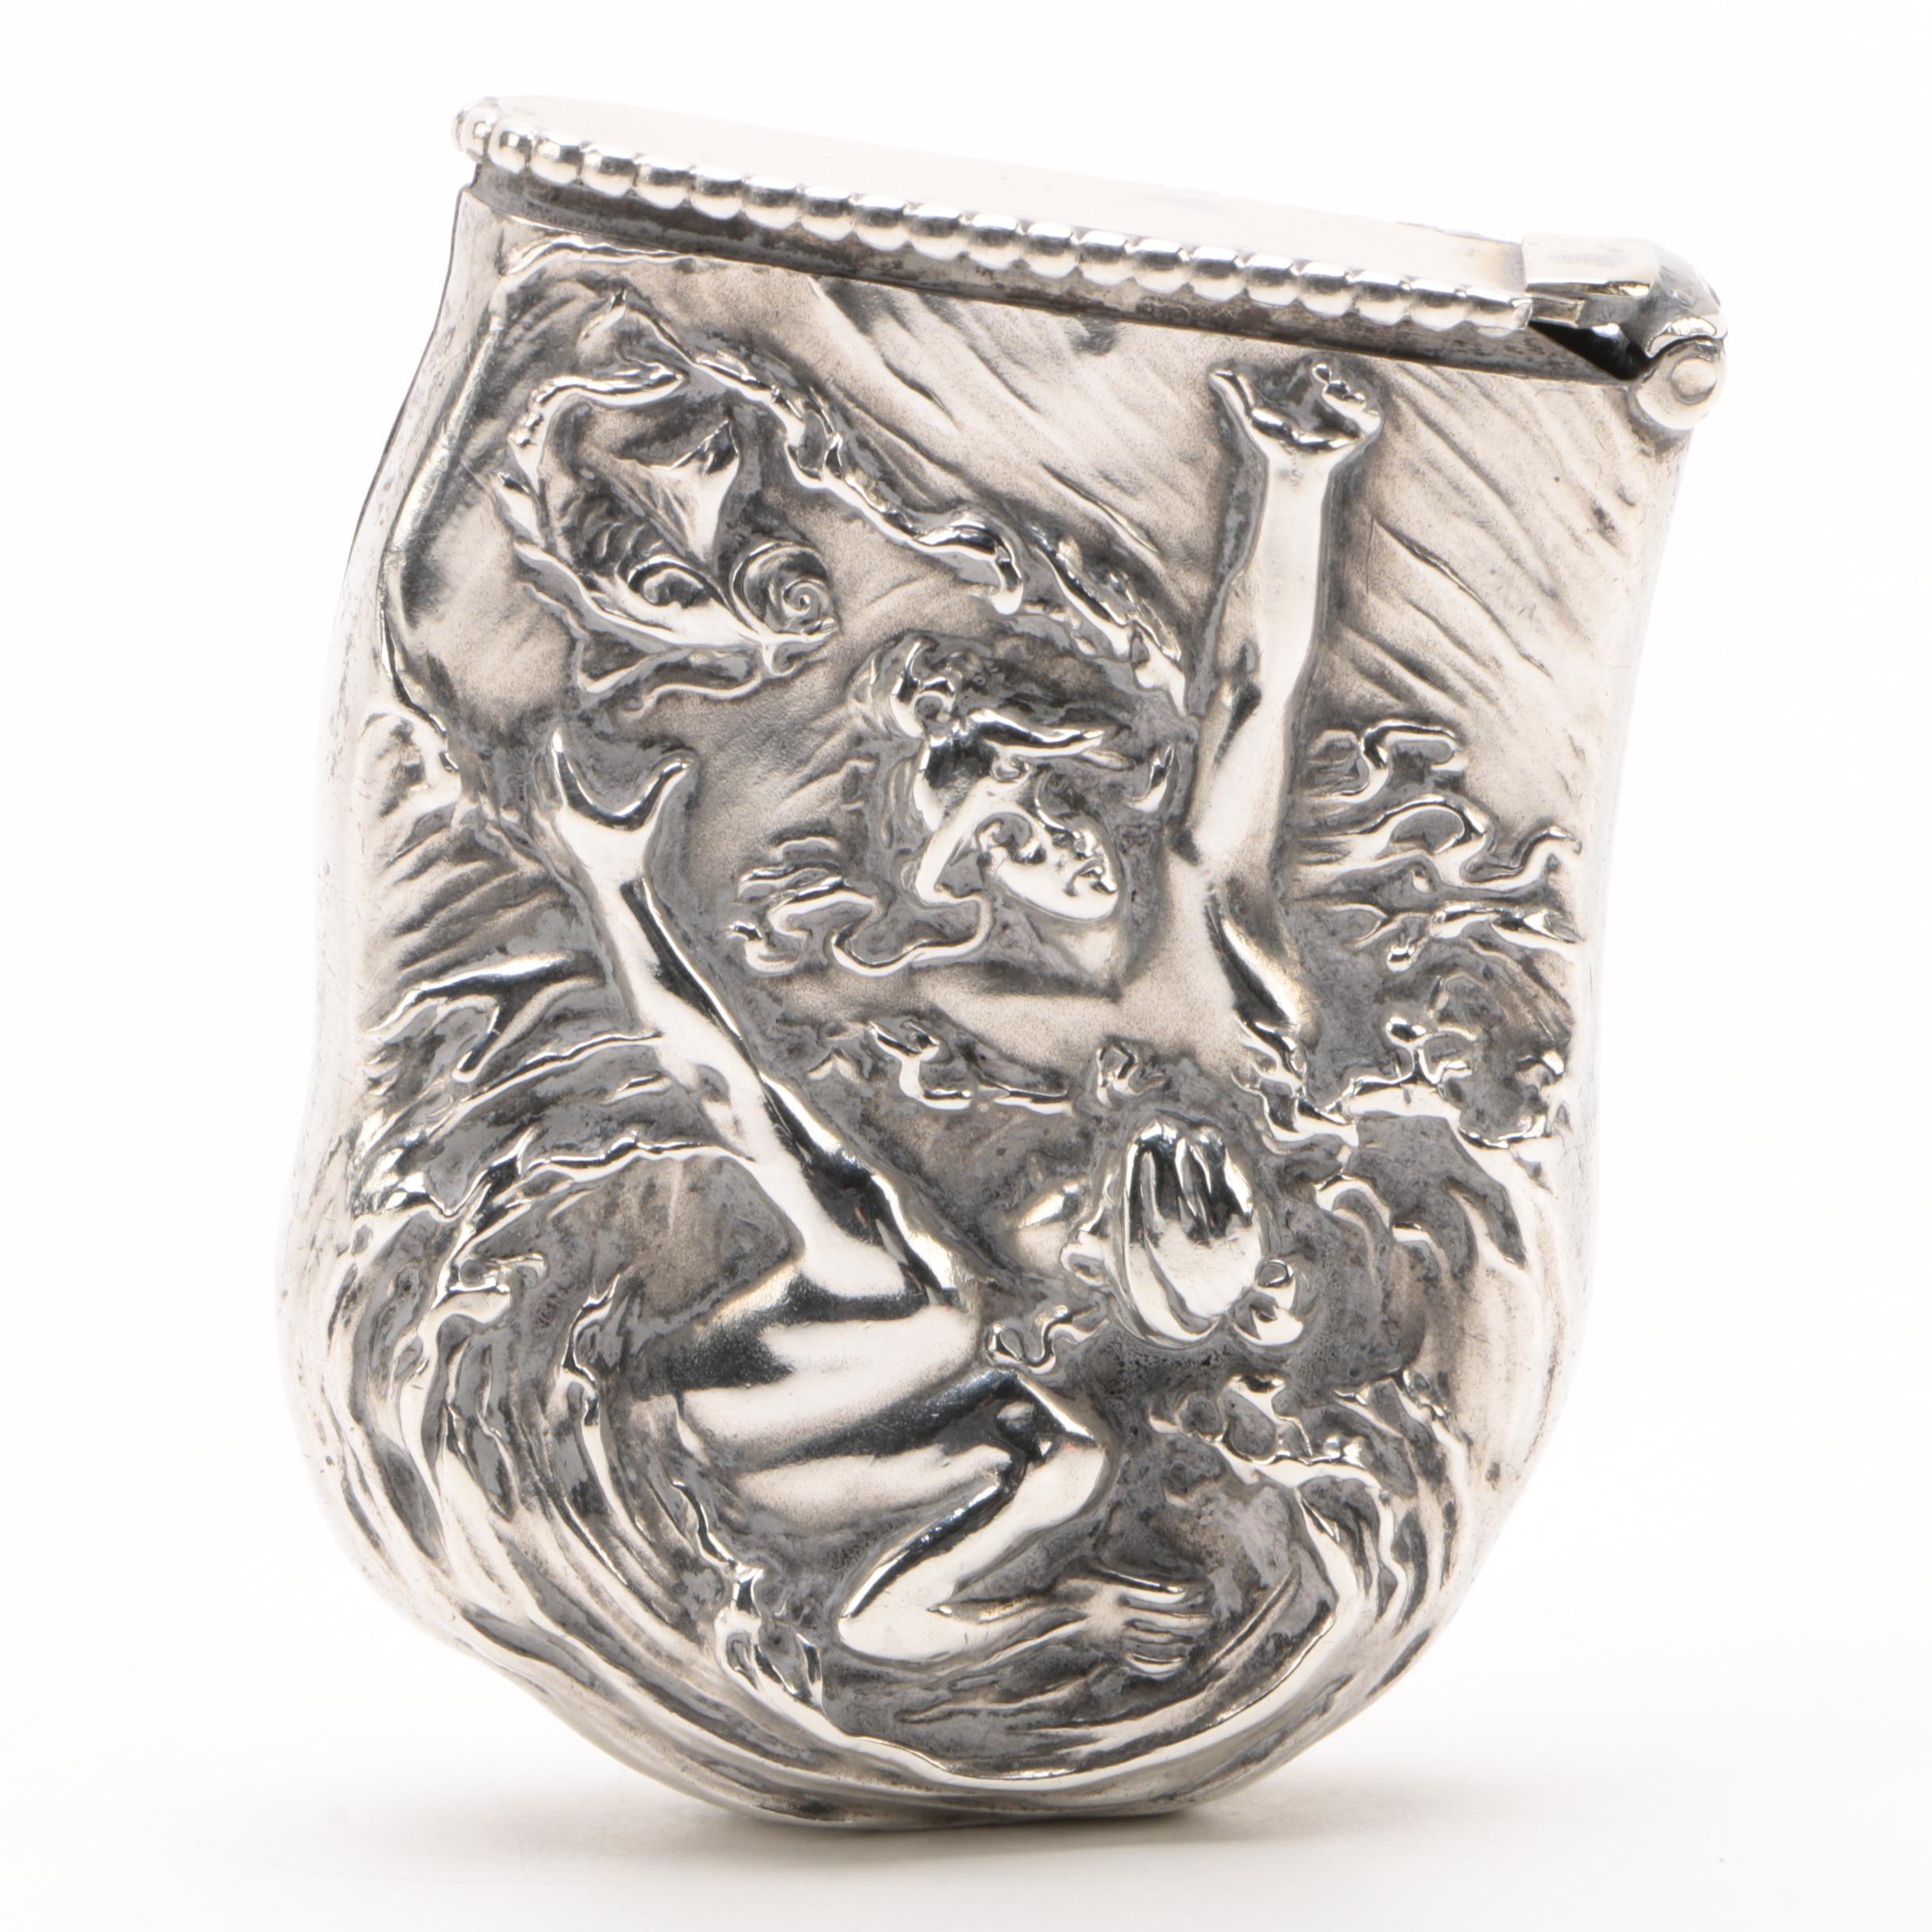 Wm. B. Kerr & Co. Sterling Silver Match Case from American Beauty Series